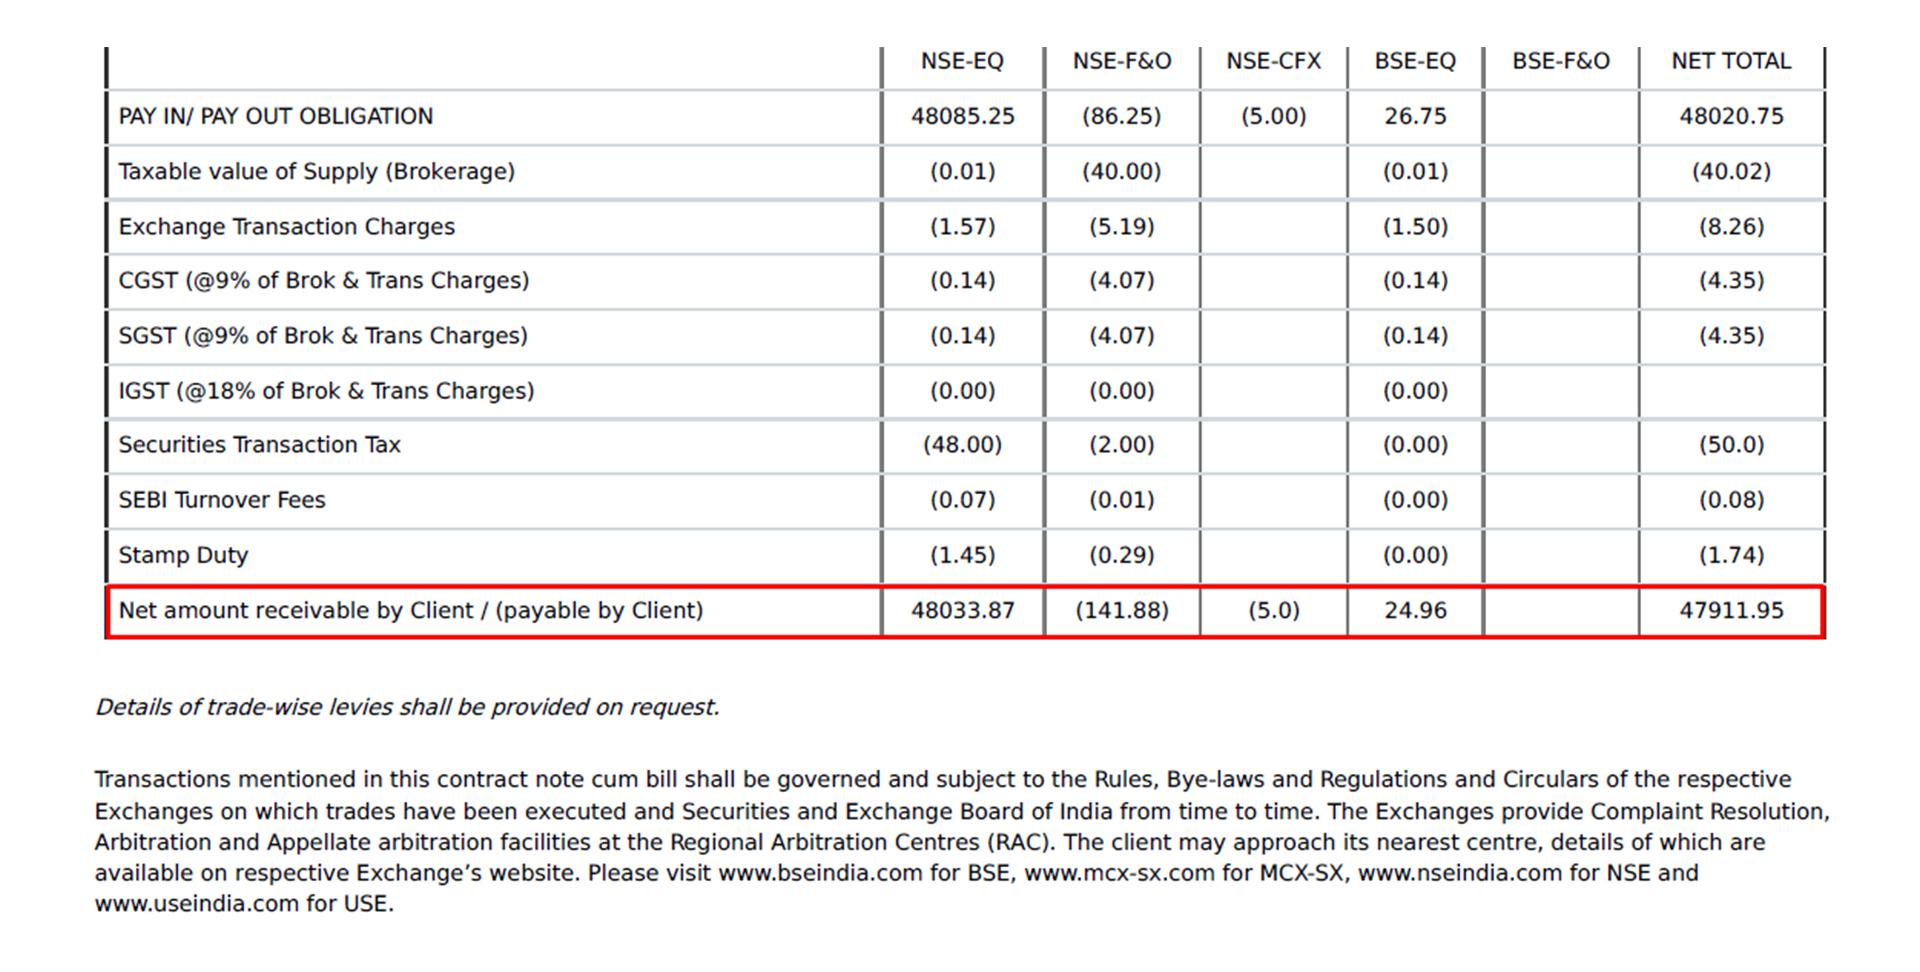 Interpretation of Contract Note (Page 2)